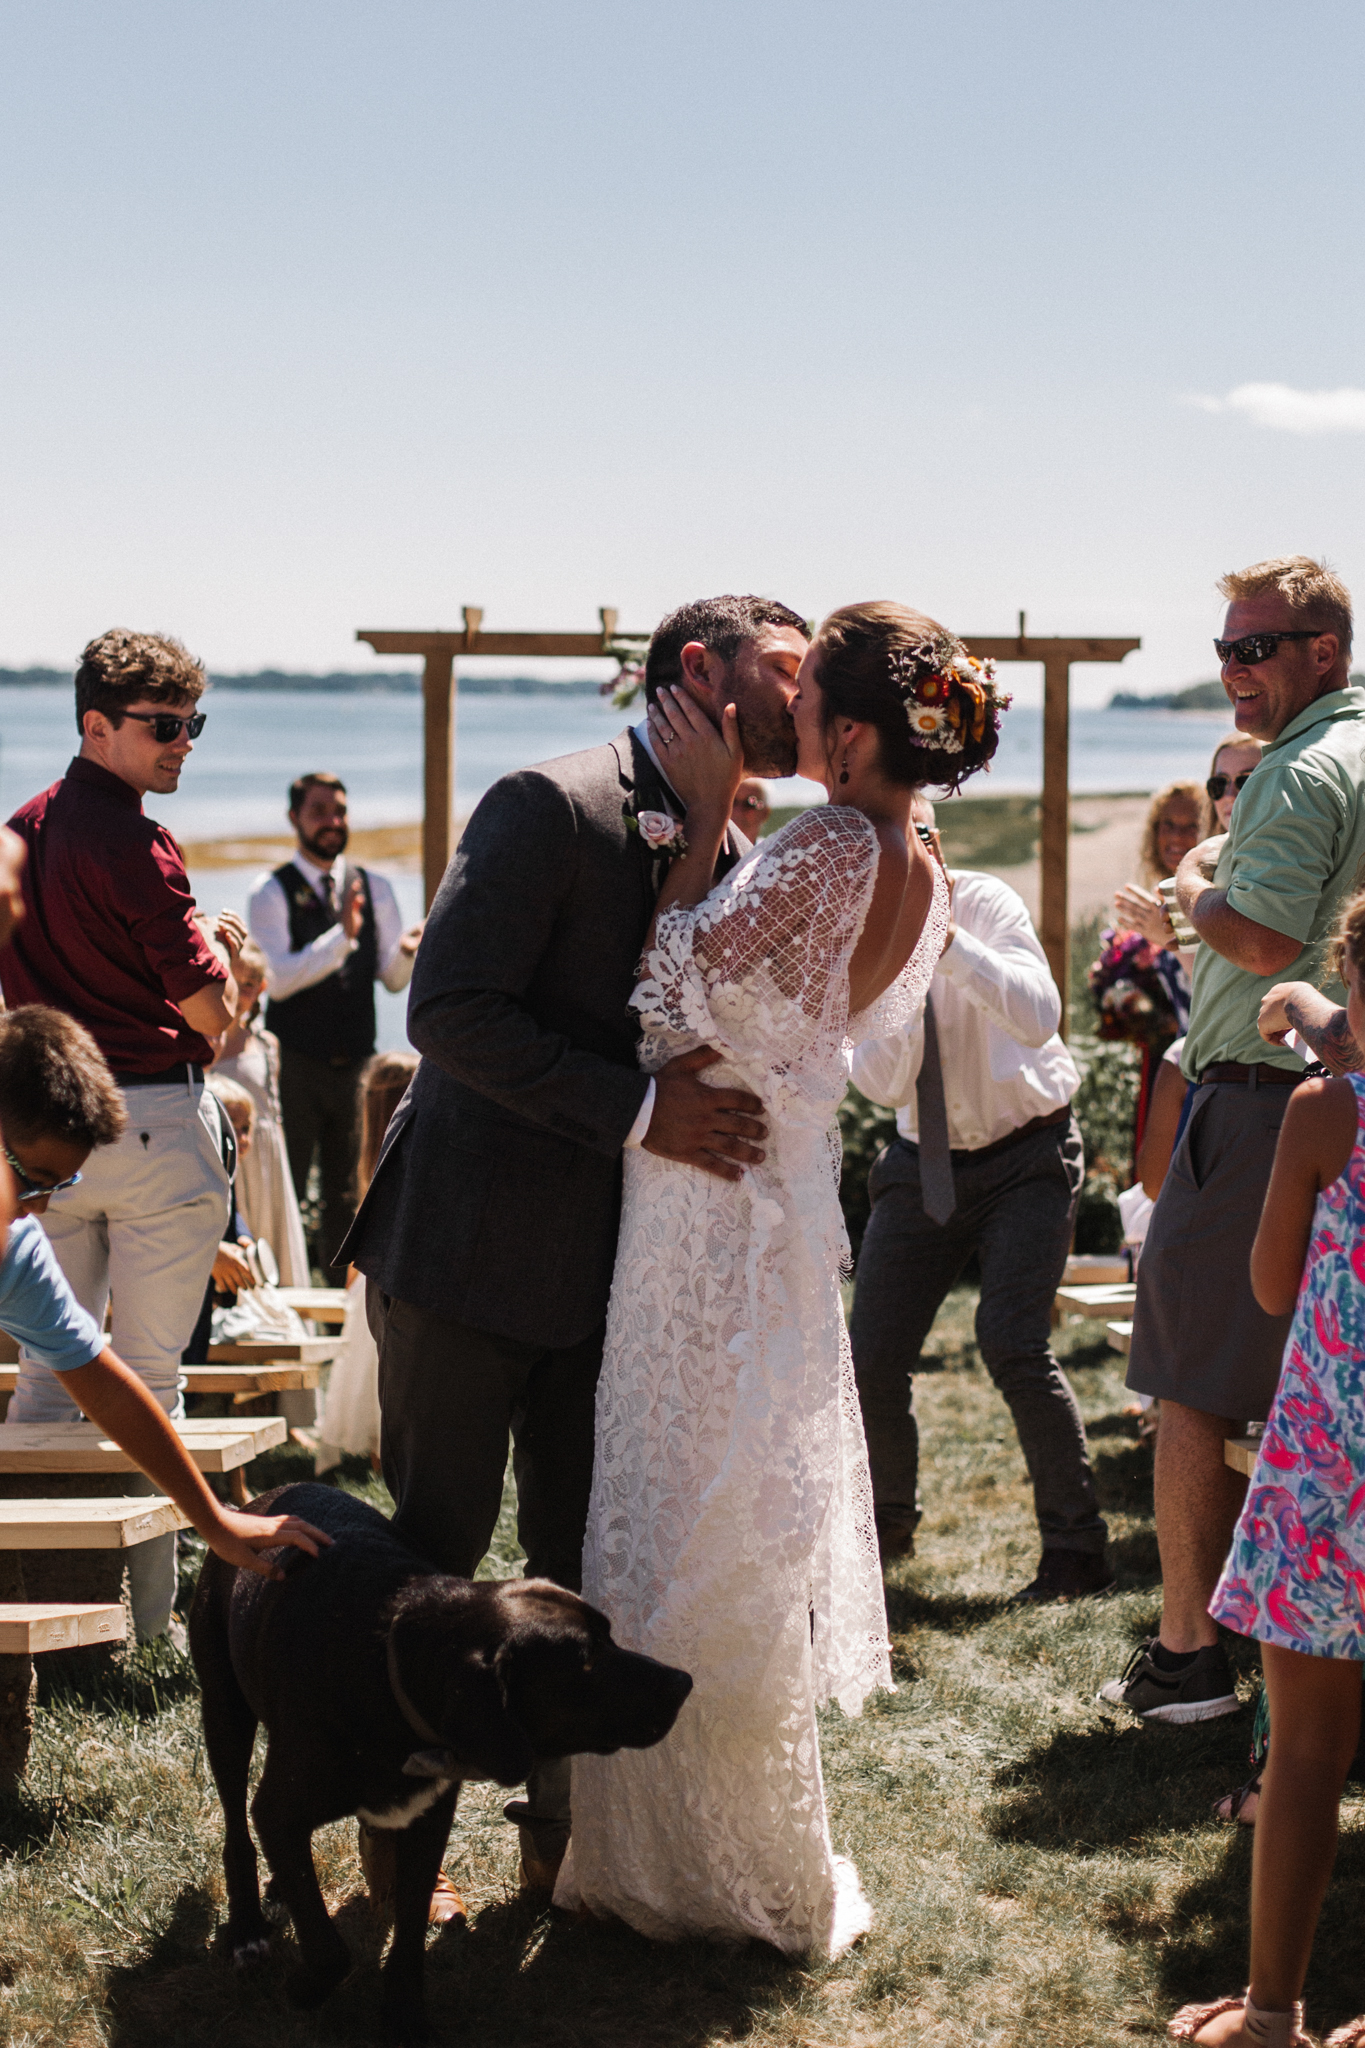 Damian and Jesse Chebeague Island Maine Backyard Destination Beach Wedding White Sails Creative_106.JPG